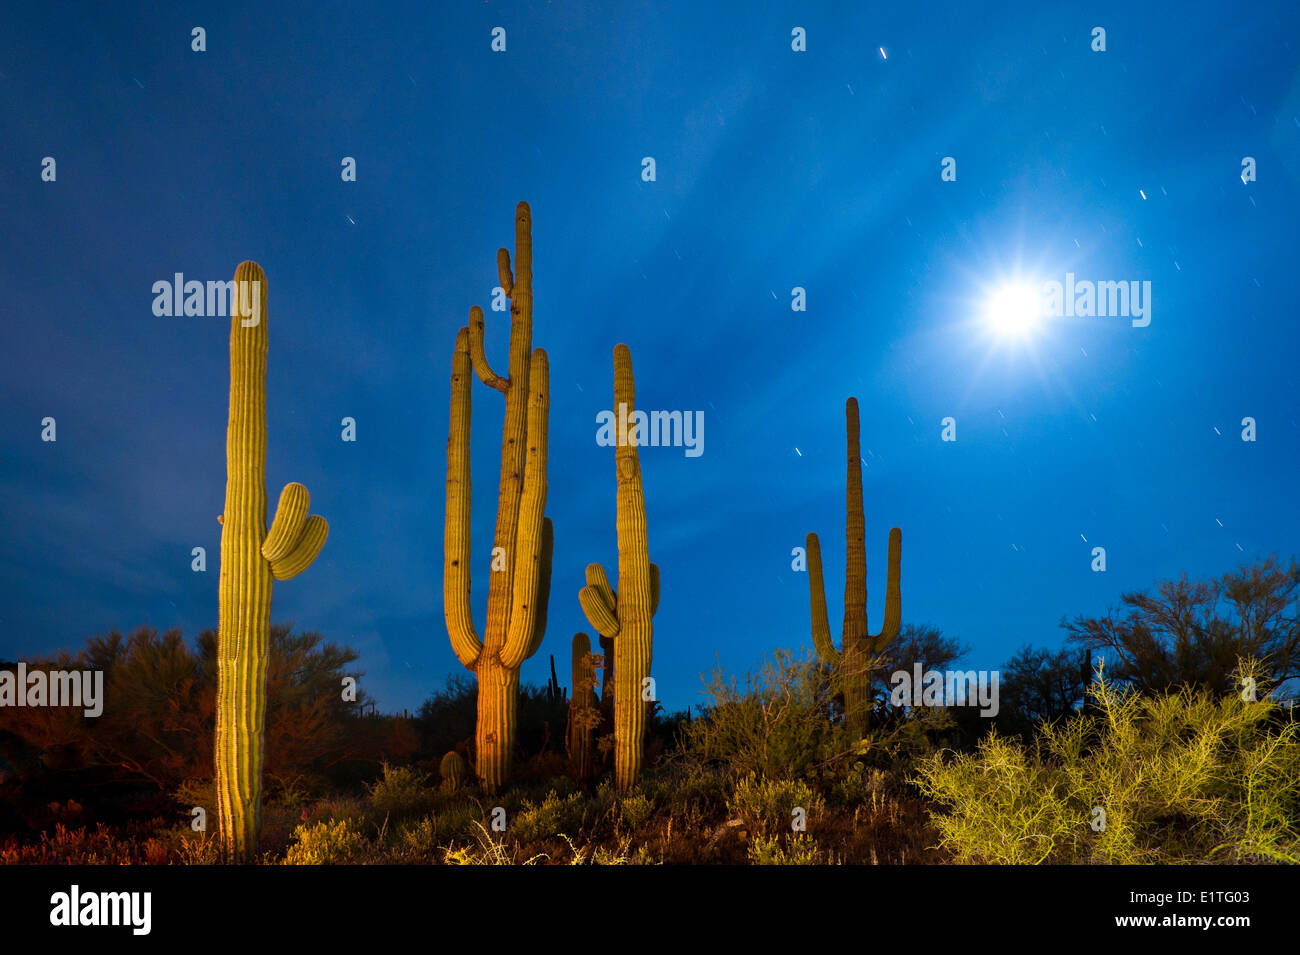 Saguaro cacti at night with setting moon, Arizona. U.S.A. - Stock Image